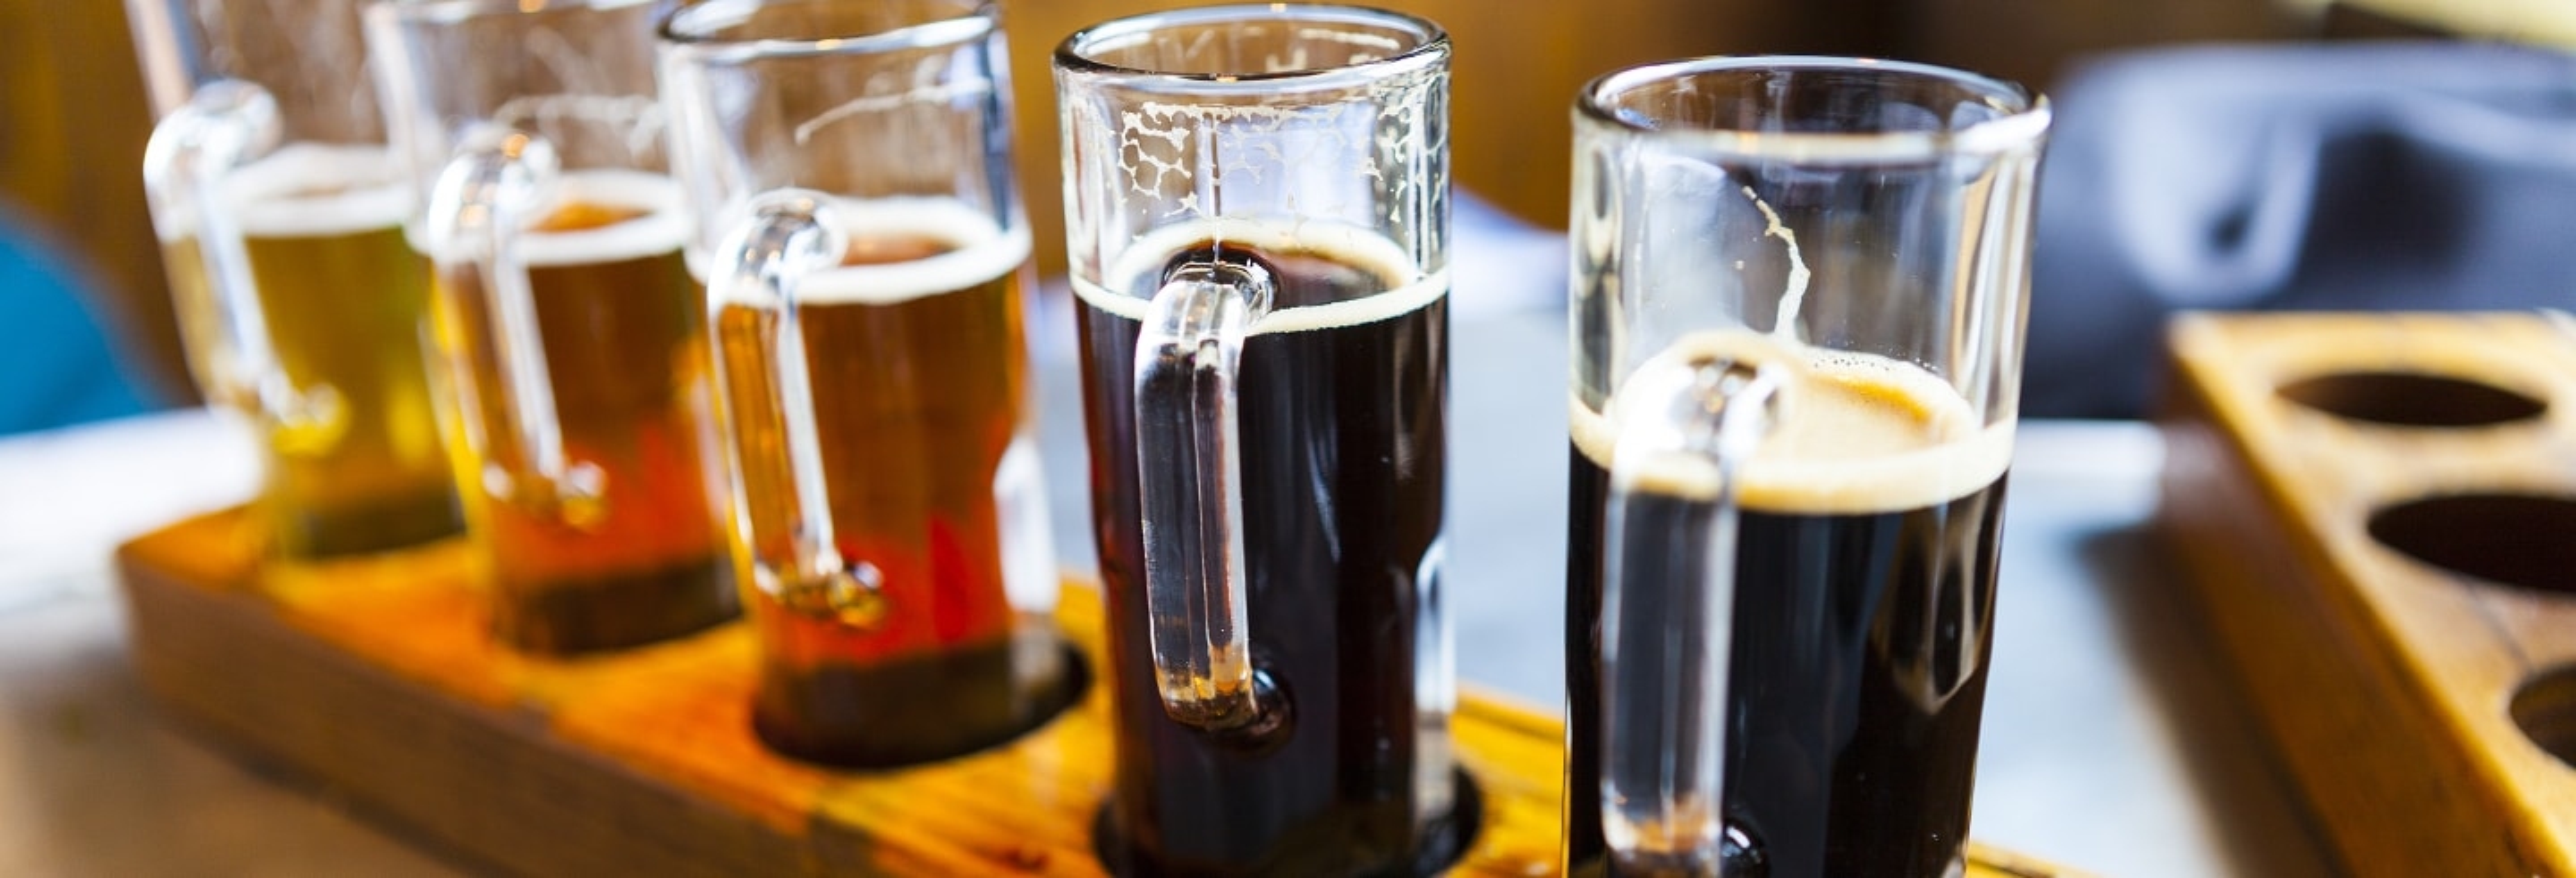 Tour de la cerveza artesanal por San José